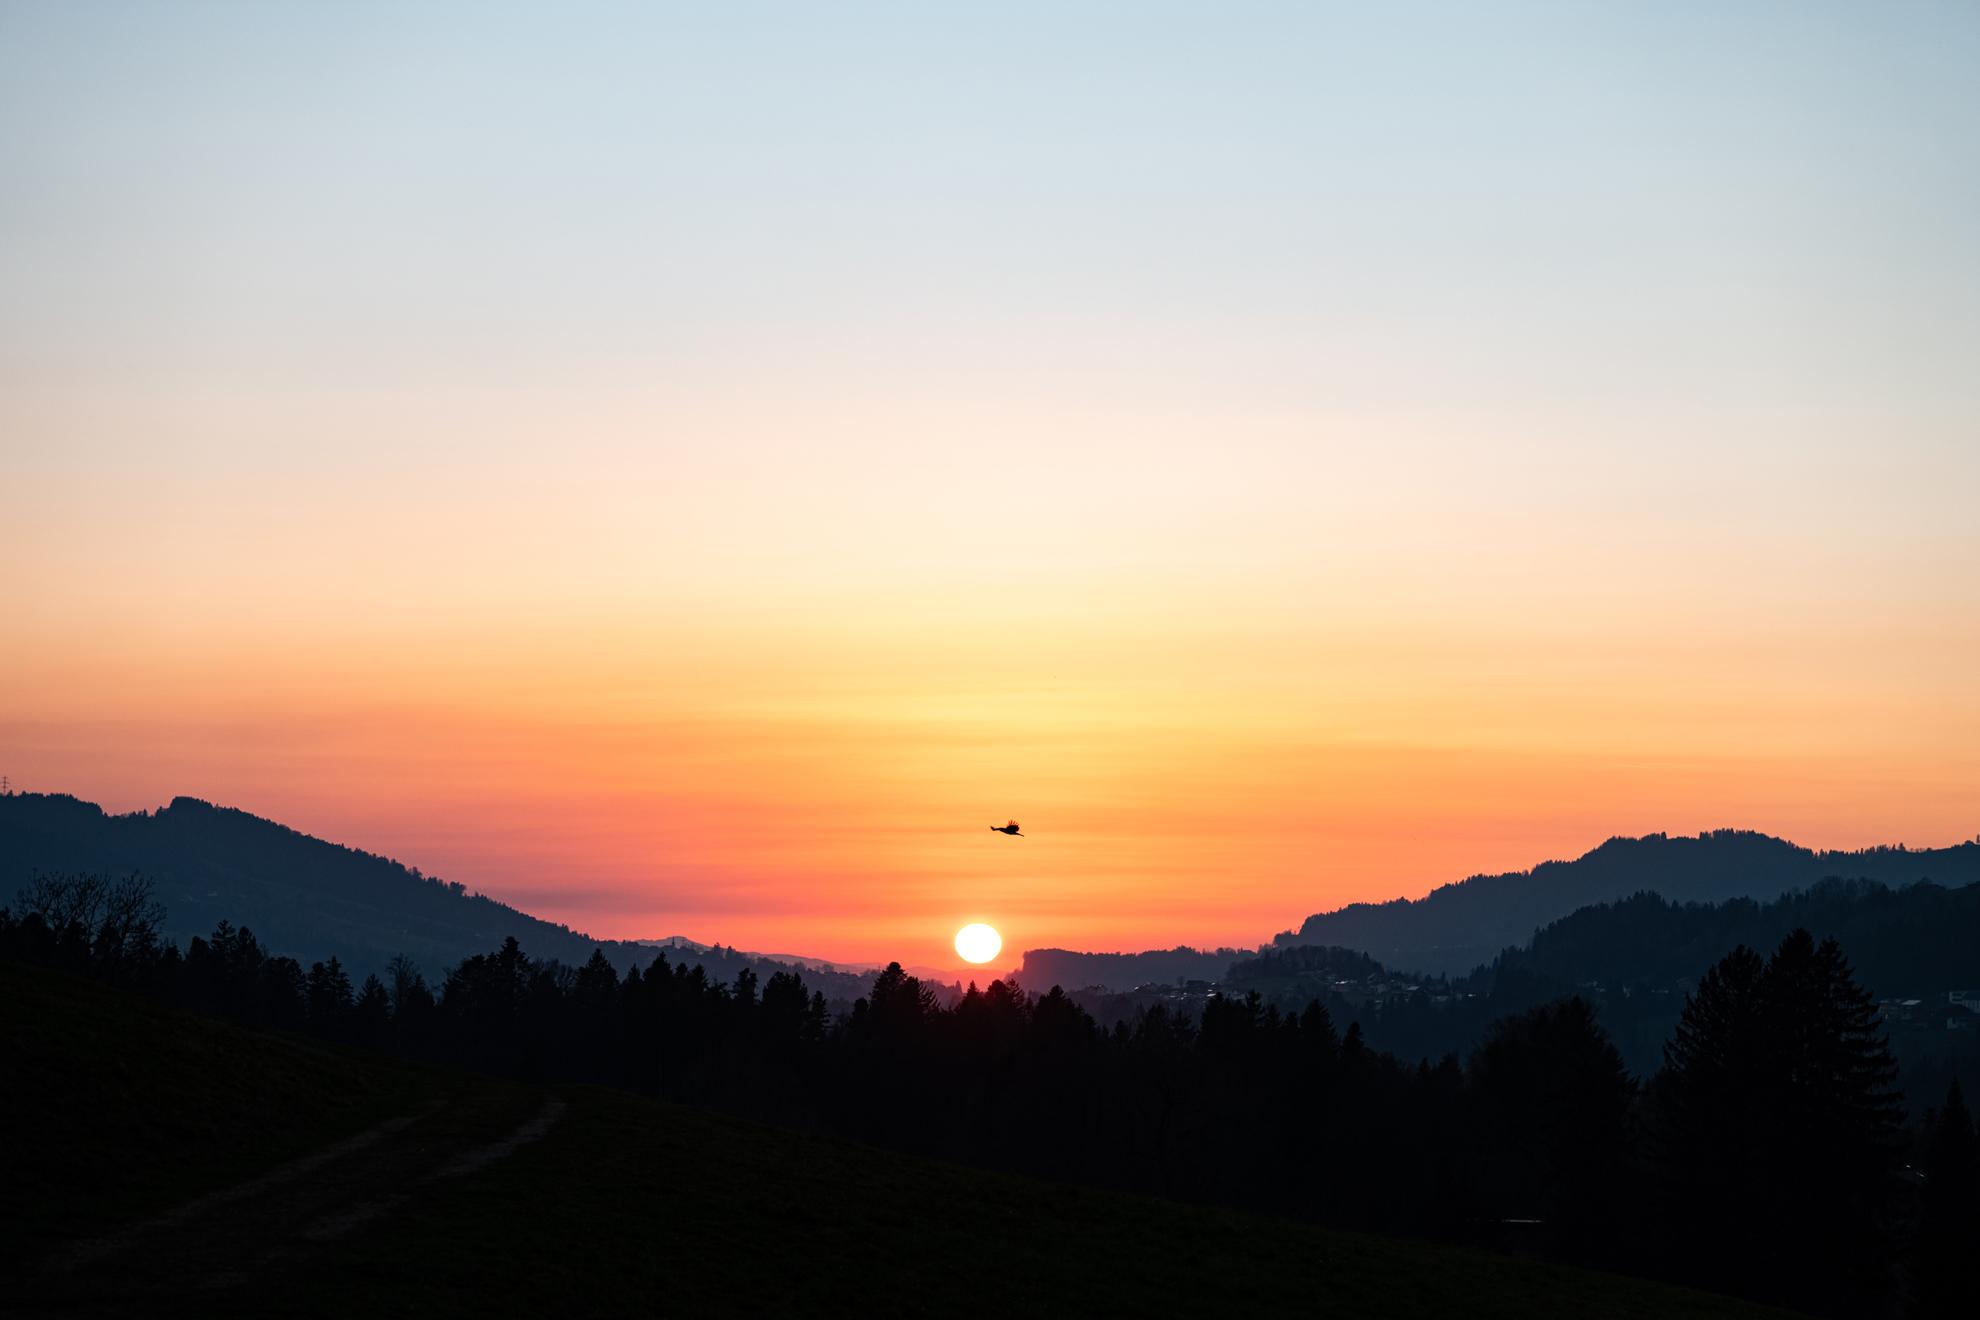 Sonnenuntergang am 18. März 2020